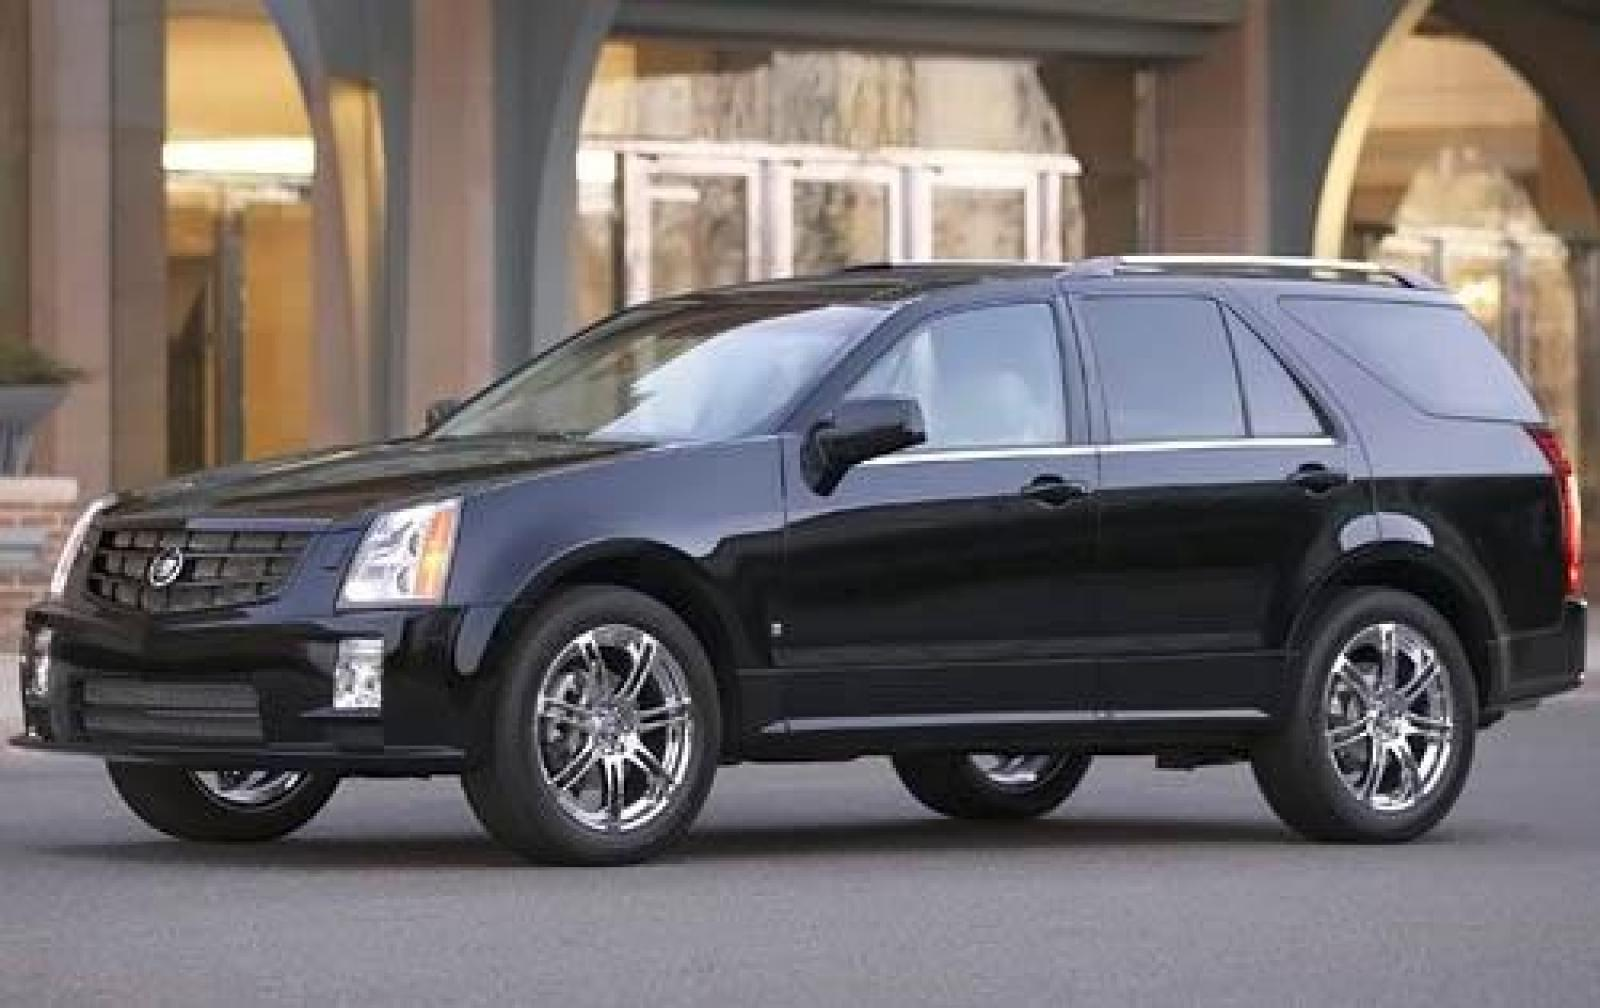 800 1024 1280 1600 Origin 2009 Cadillac Srx